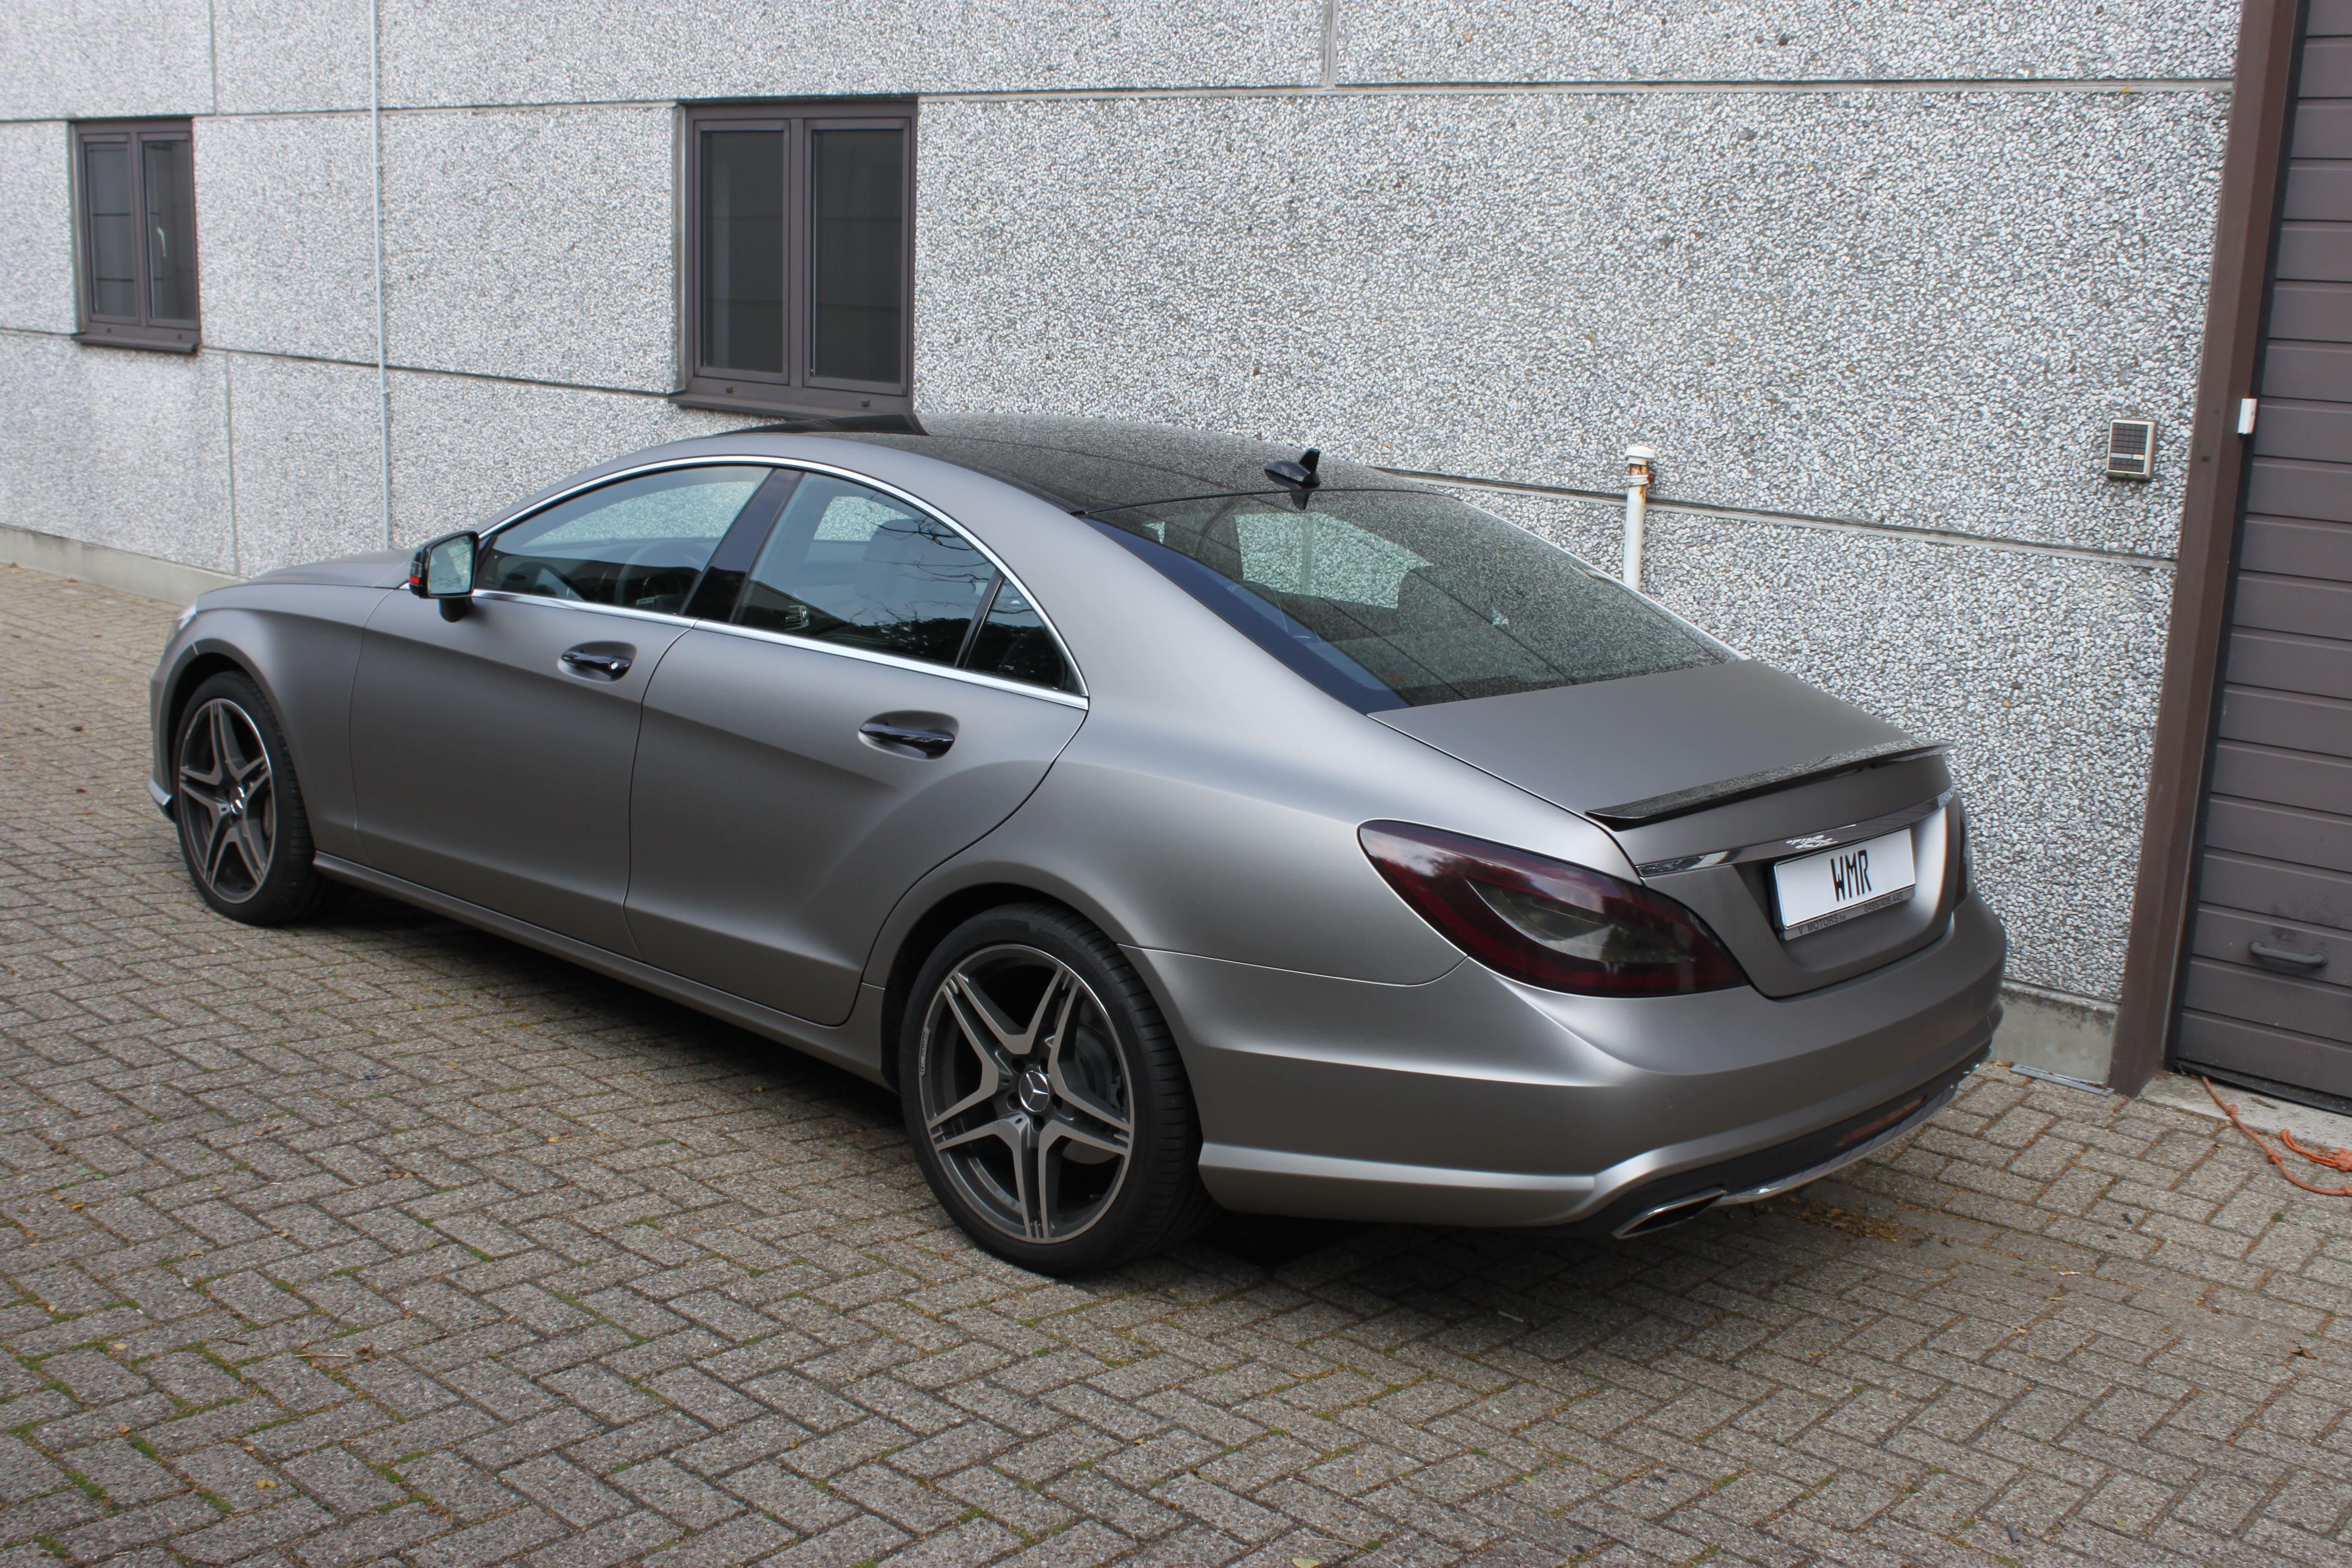 Mercedes CLS met Mat Grey Aluminium Wrap, Carwrapping door Wrapmyride.nu Foto-nr:6150, ©2020